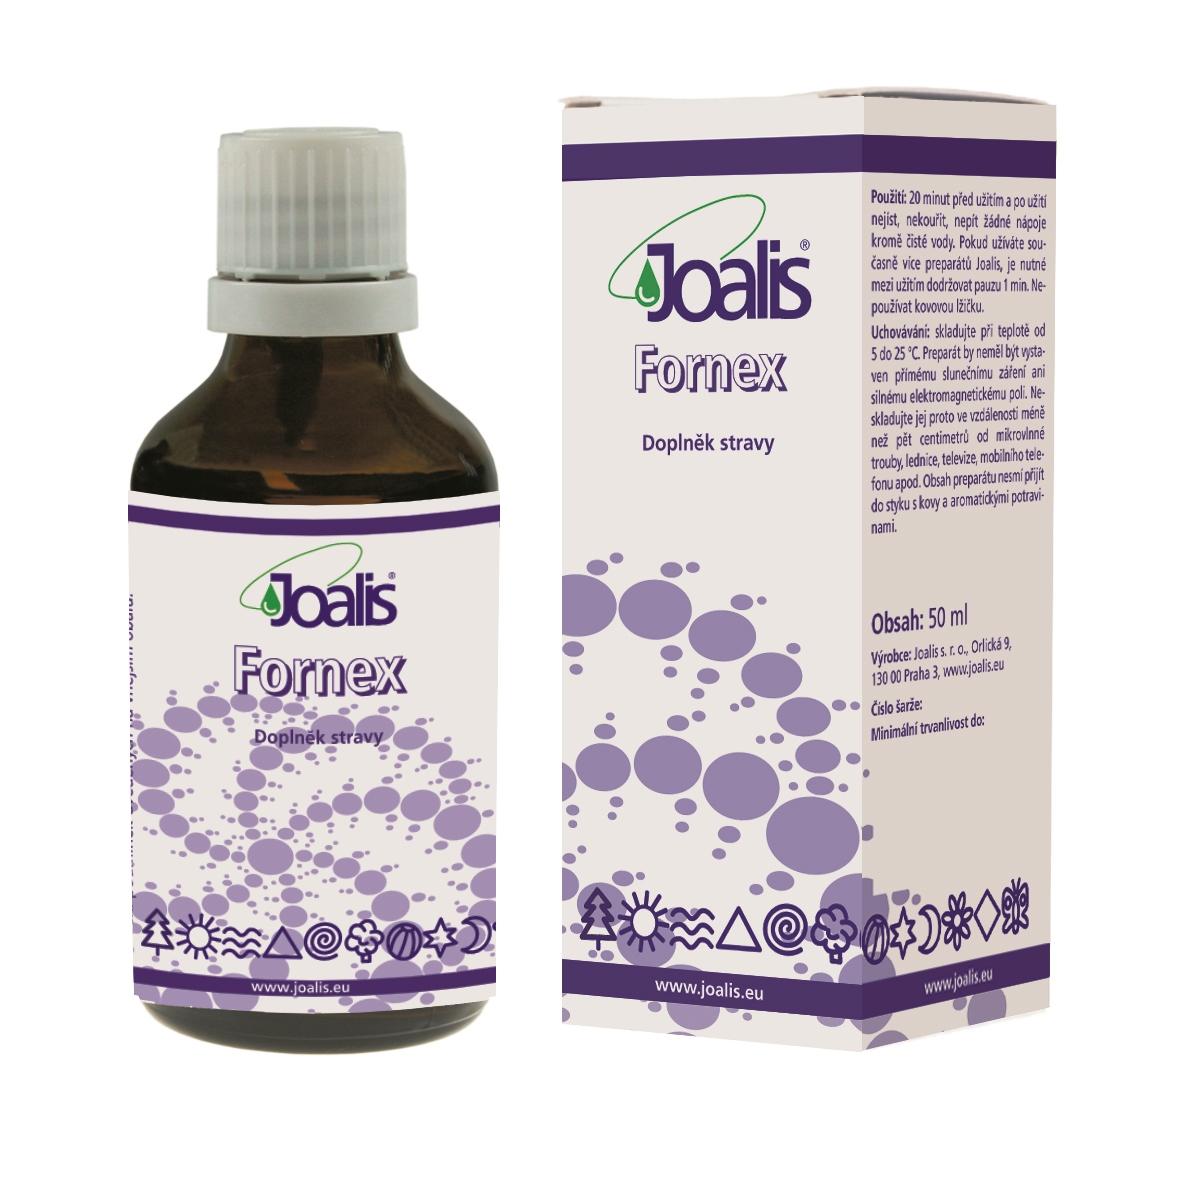 Joalis Fornex, 50ml